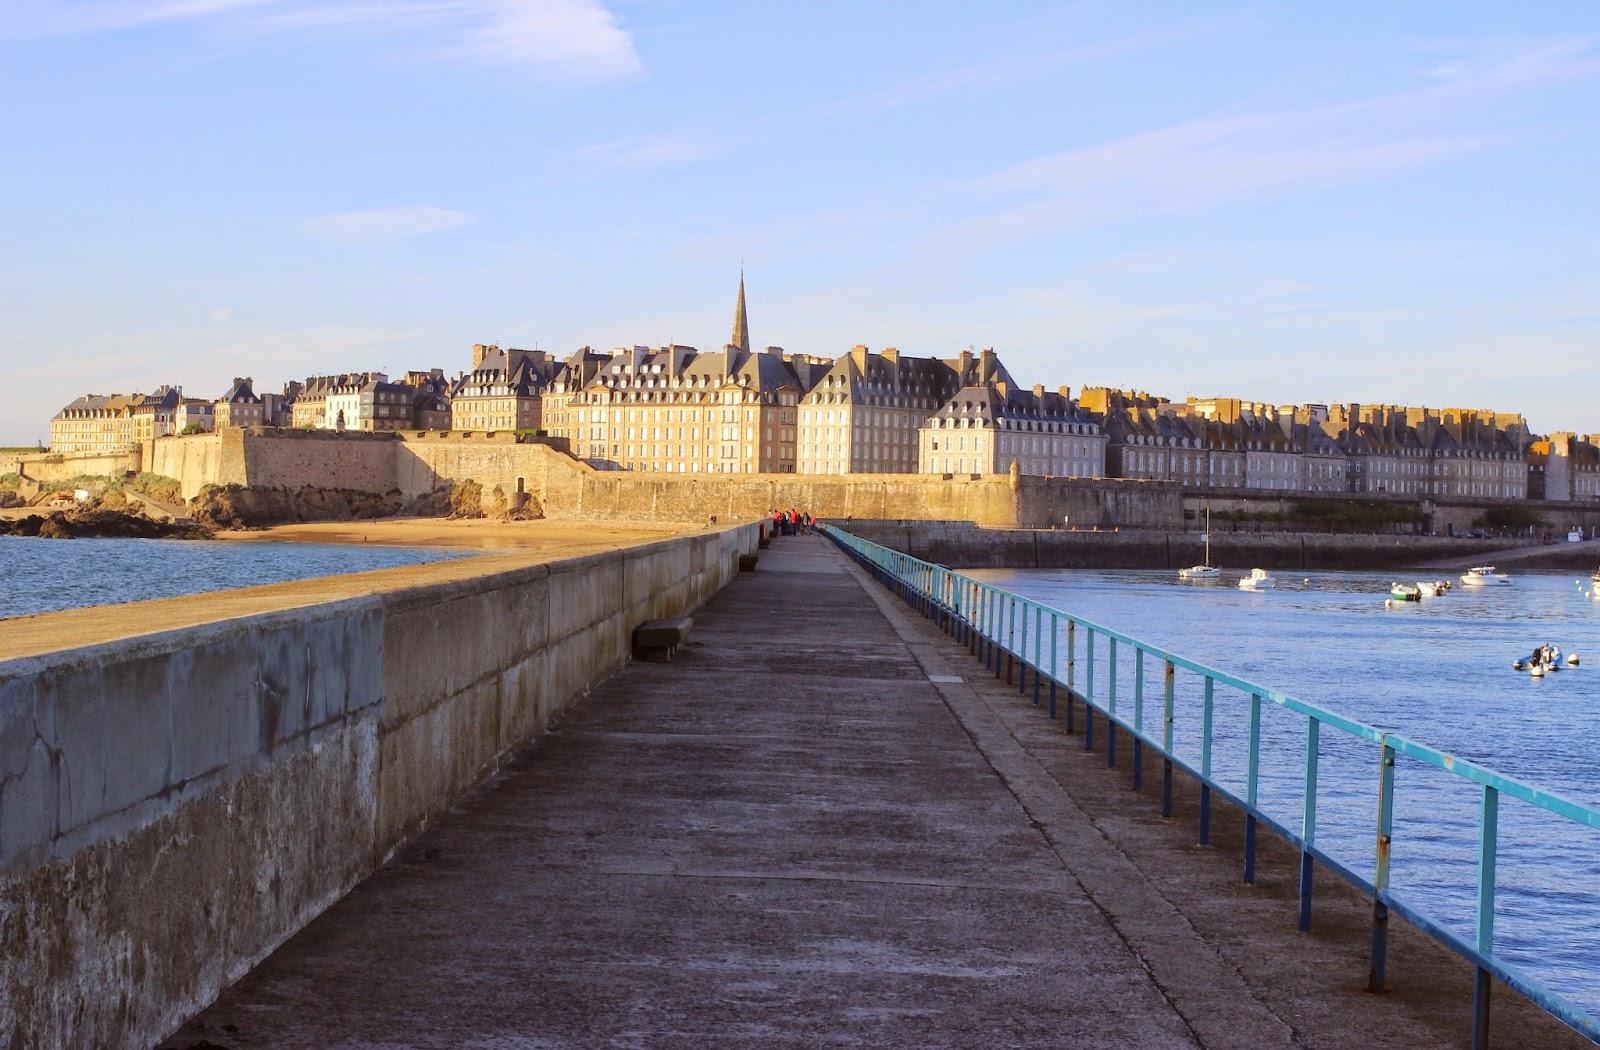 Le Chameau Bleu - Blog Voyage Saint Malo France - Saint Malo depuis son phare - Bretagne - france